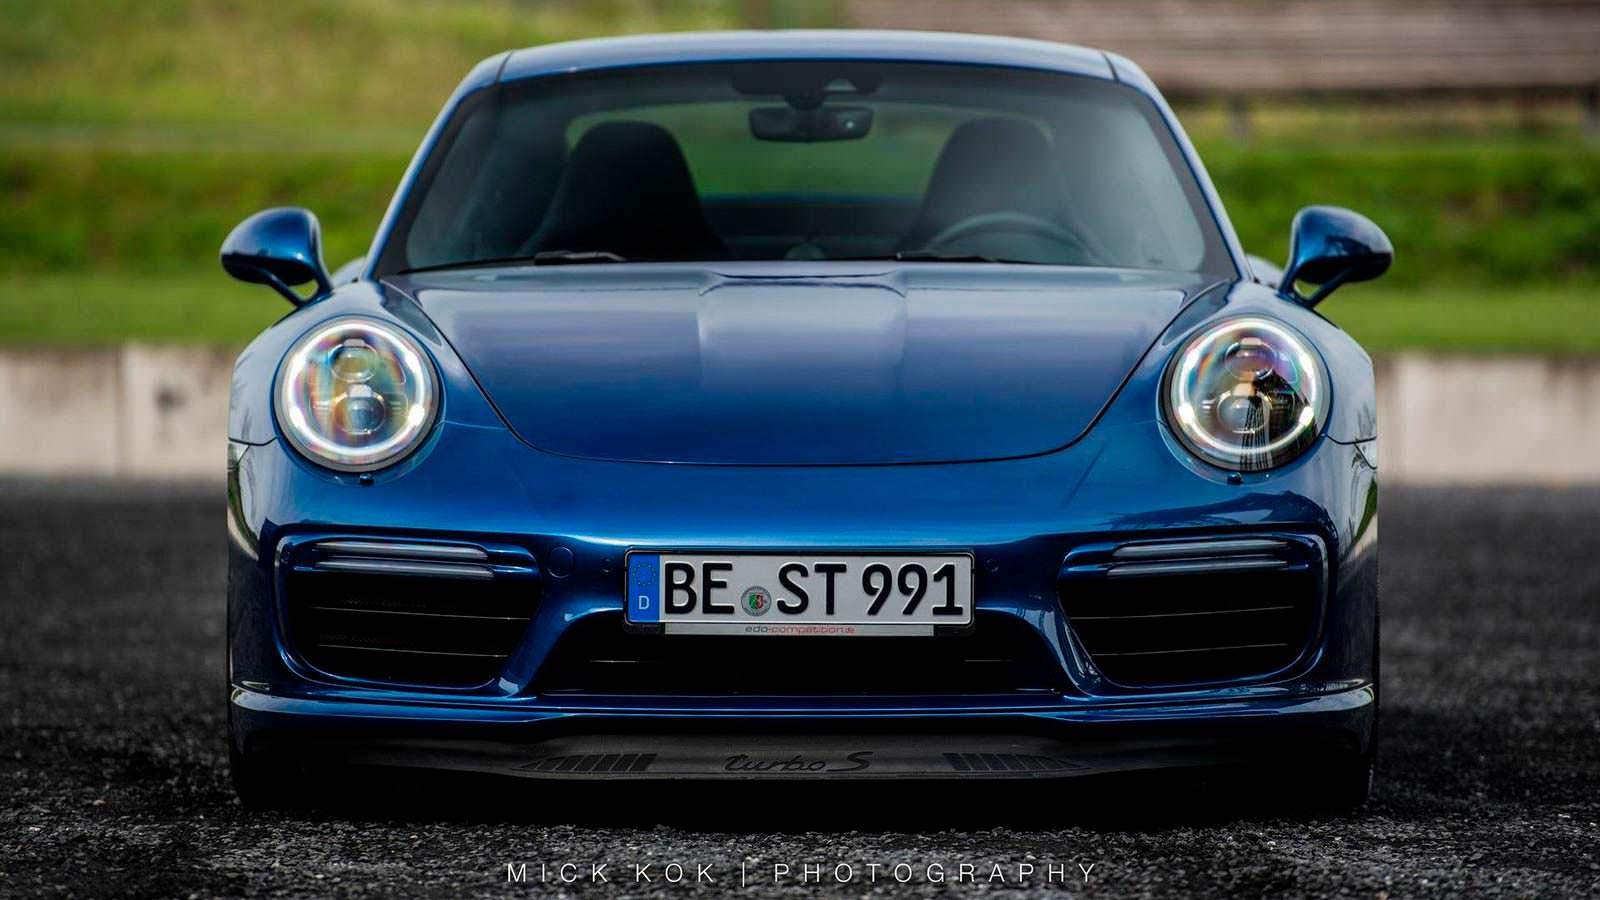 Фото | Тюнинг Porsche 911 Turbo S от Edo Competition